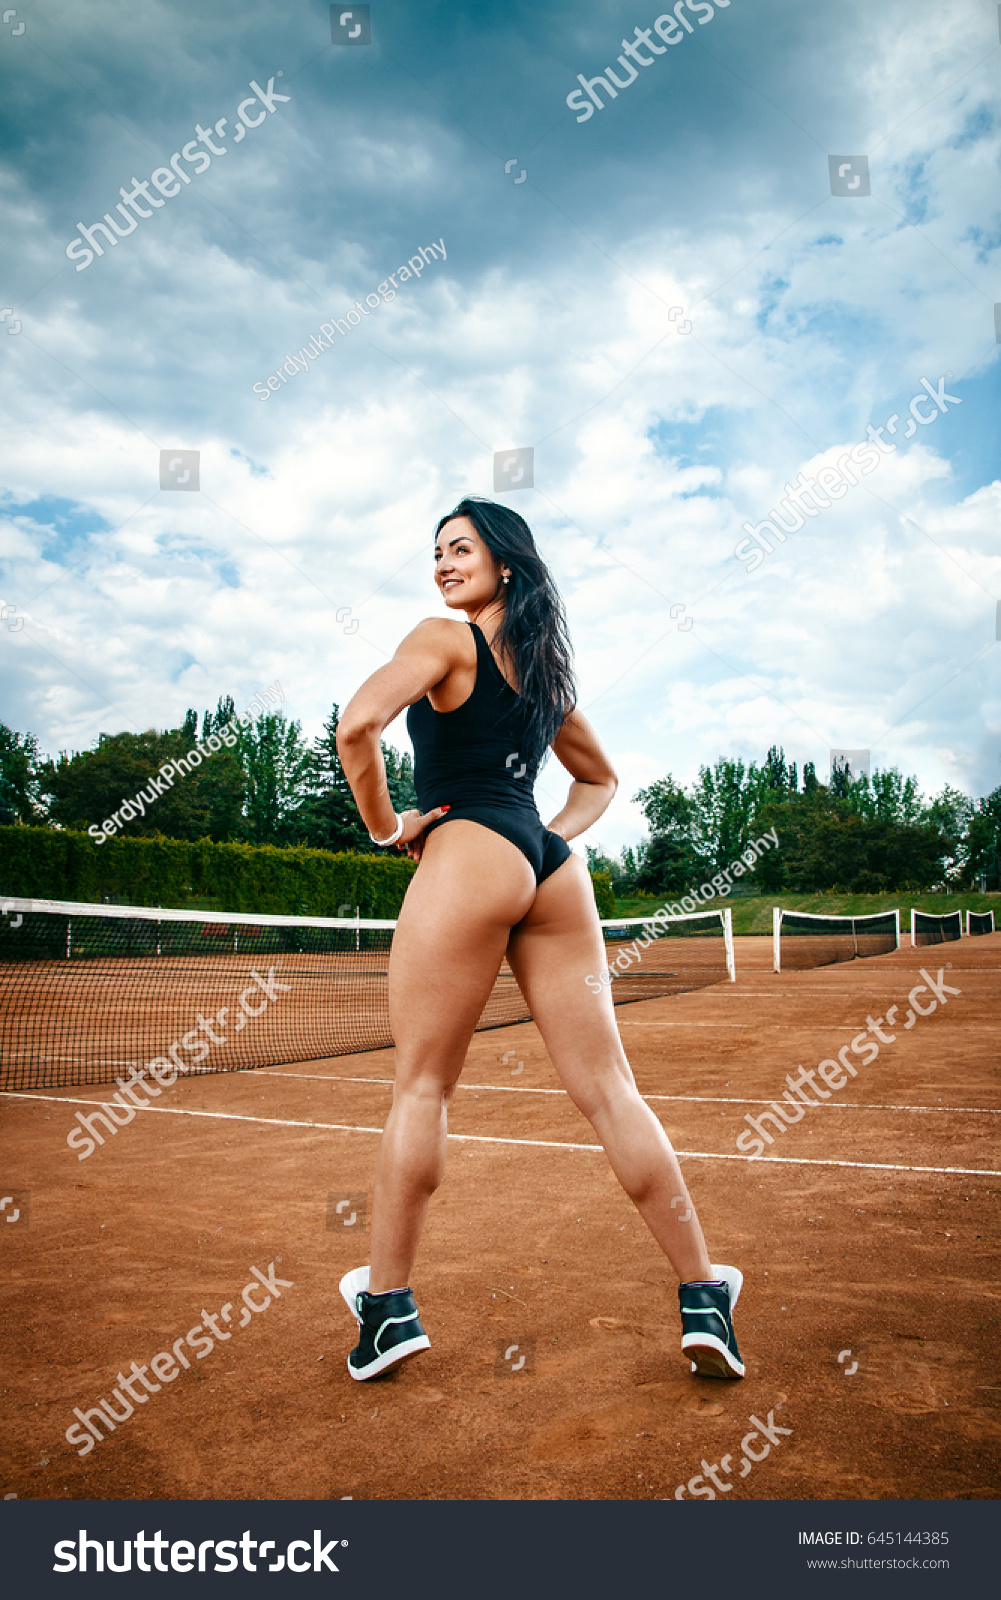 Hardcore female athlete asses